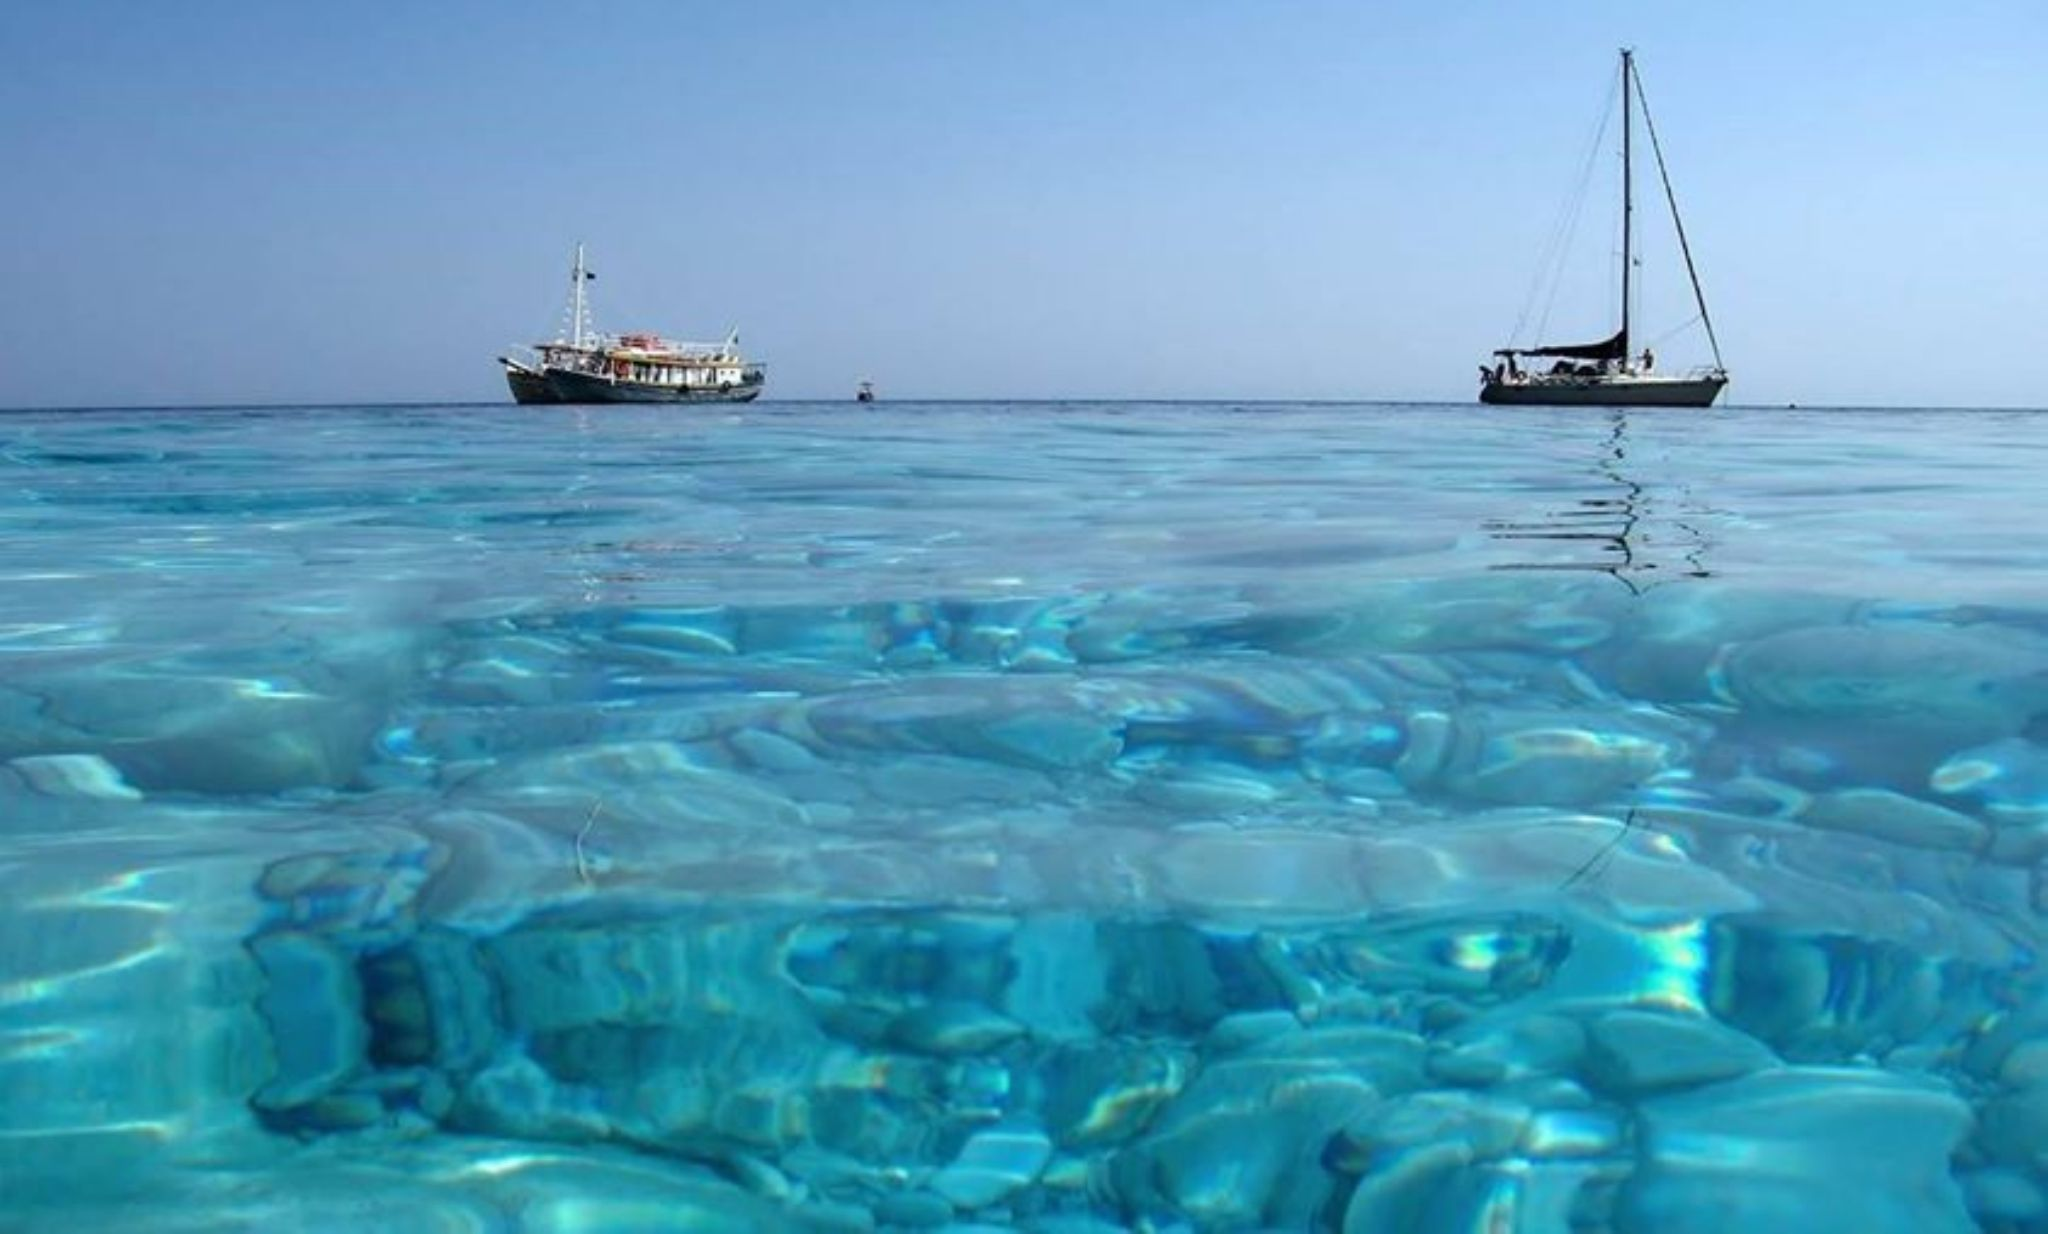 Kasos Island, Greece by kasiospaul